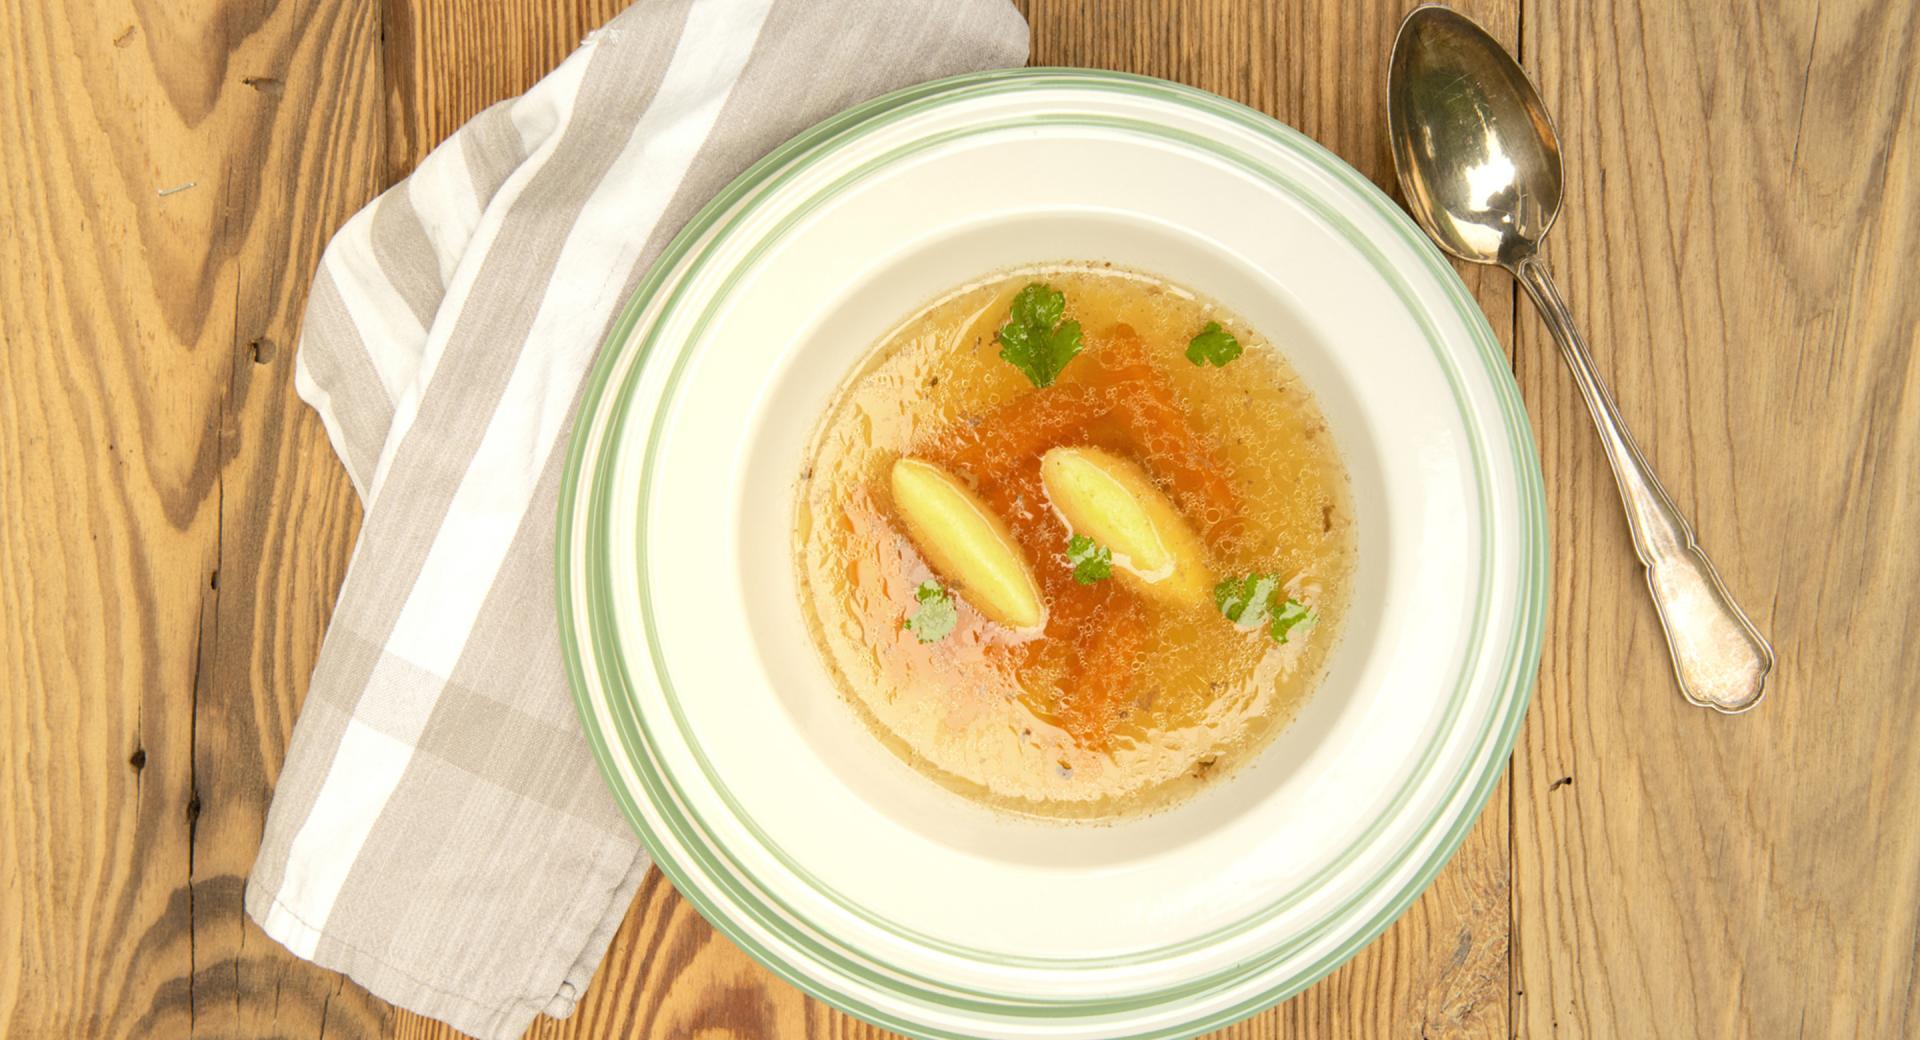 Carinthian beef soup with semolina dumplings